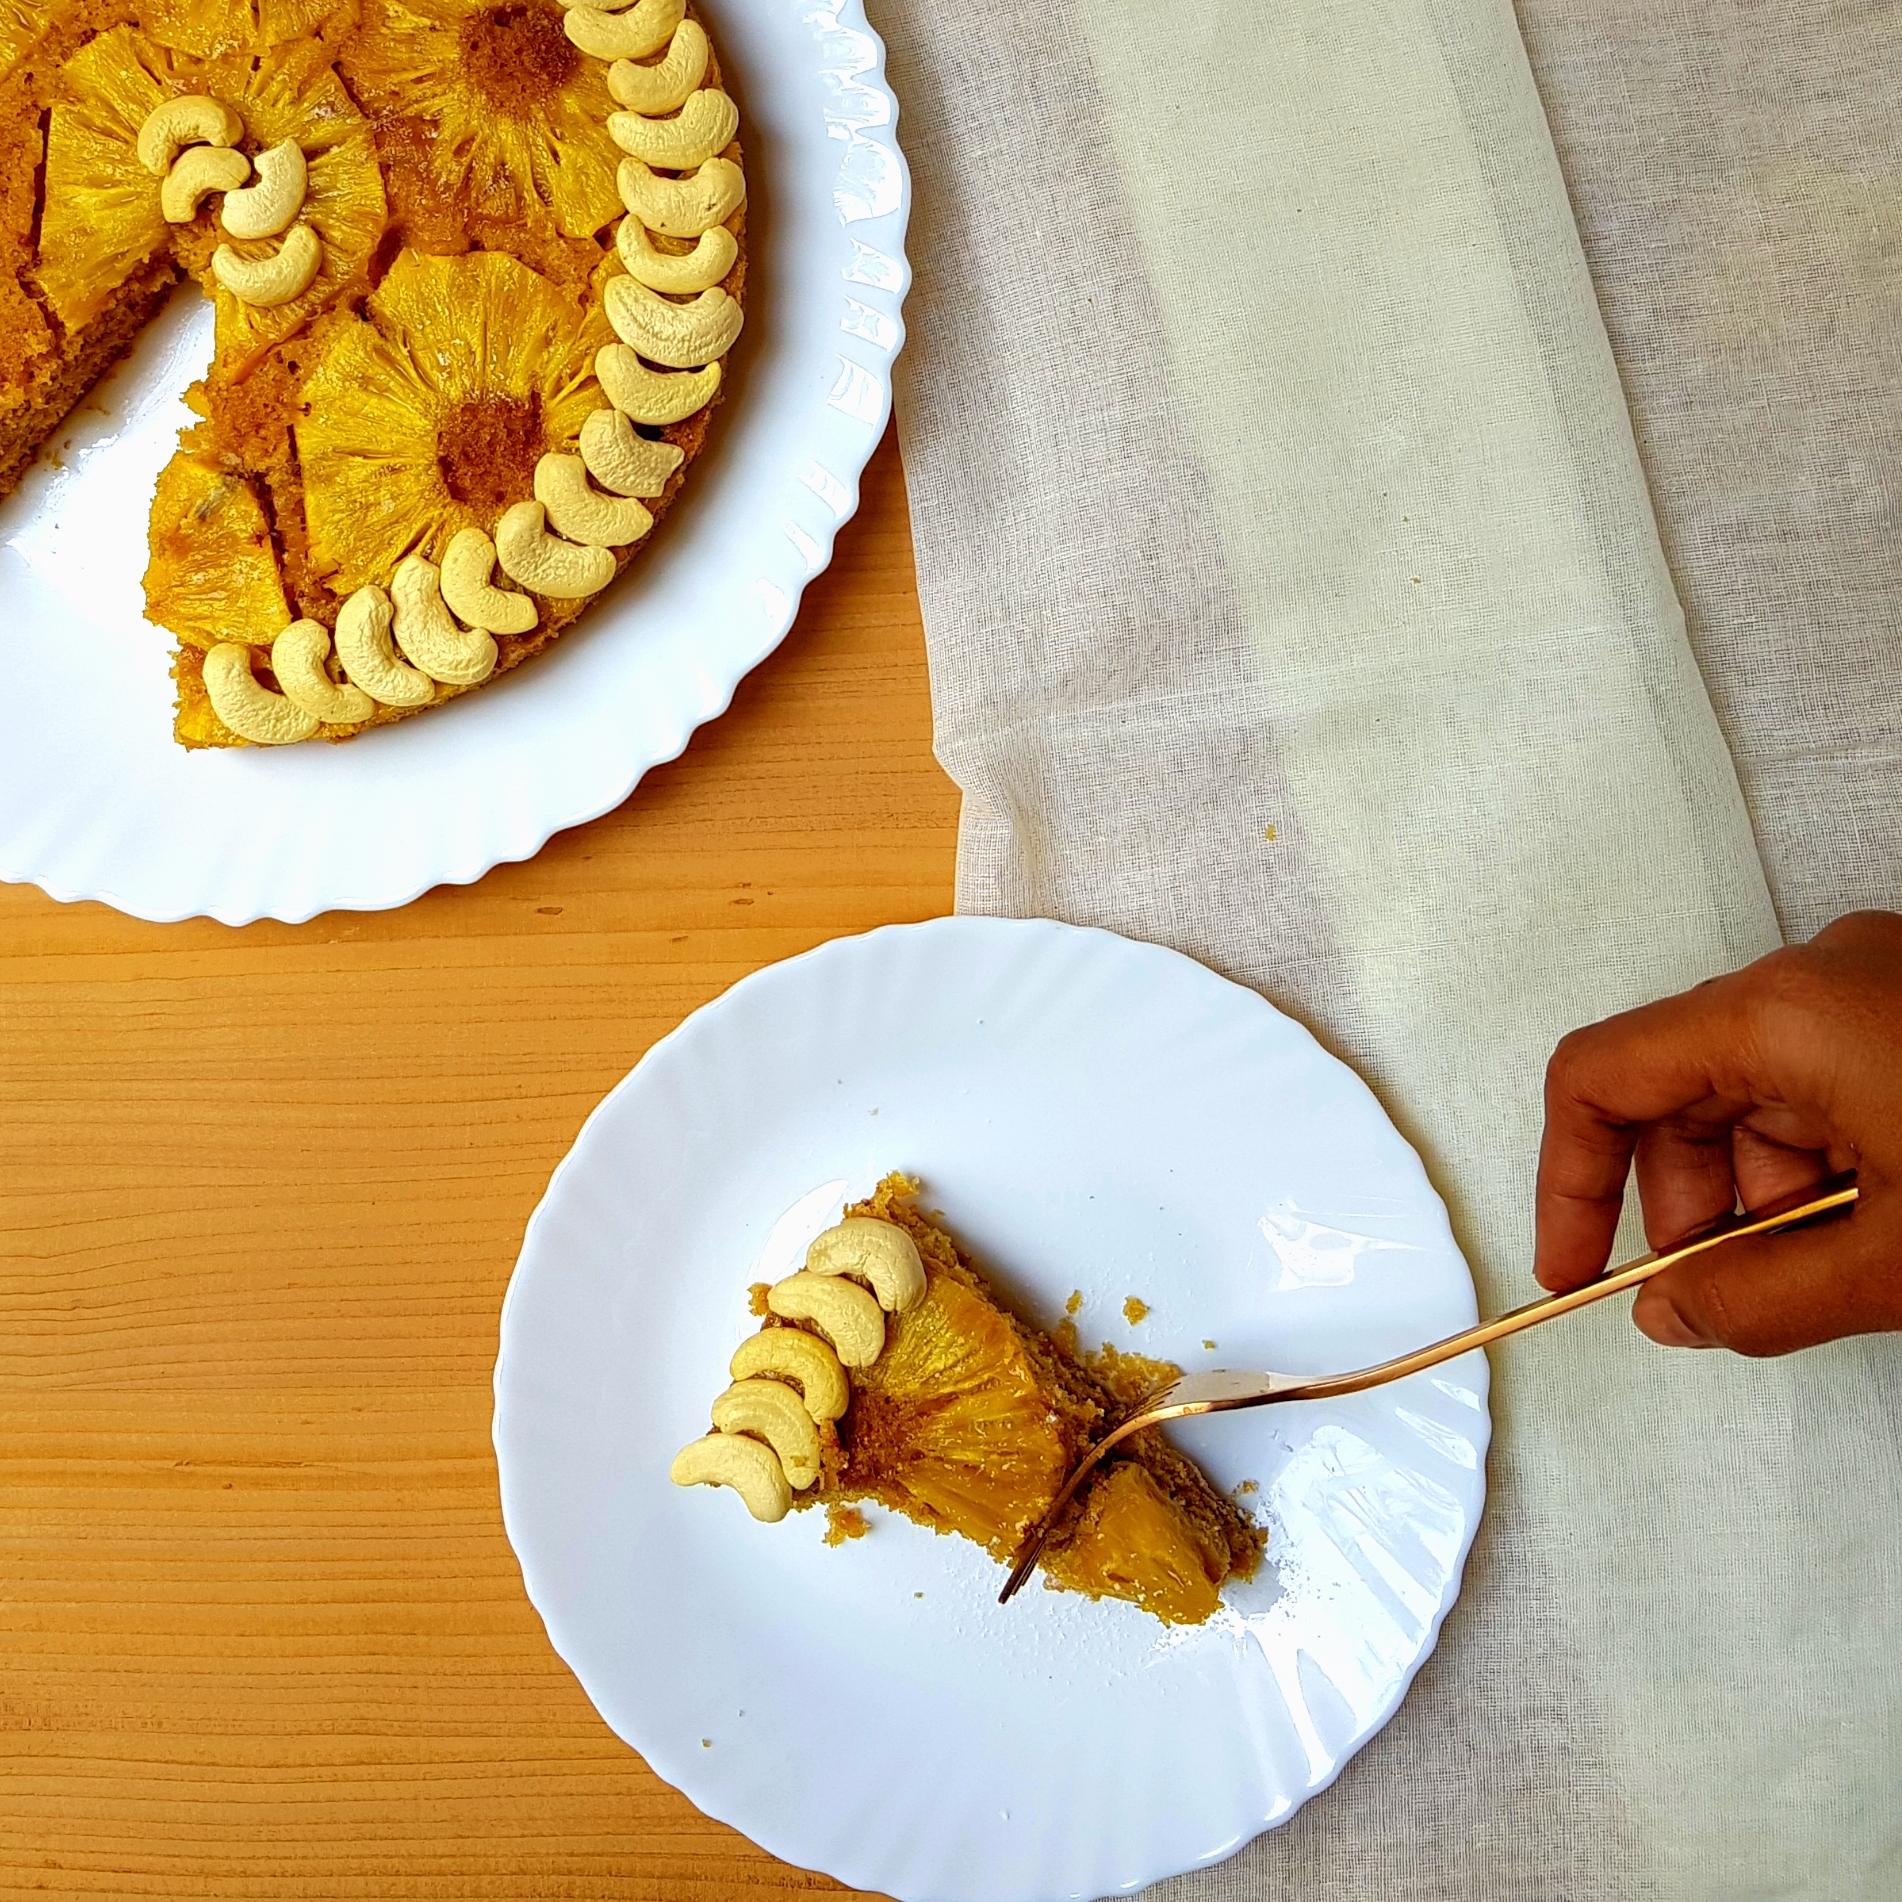 Upside-down Whole Wheat Pineapple Cake